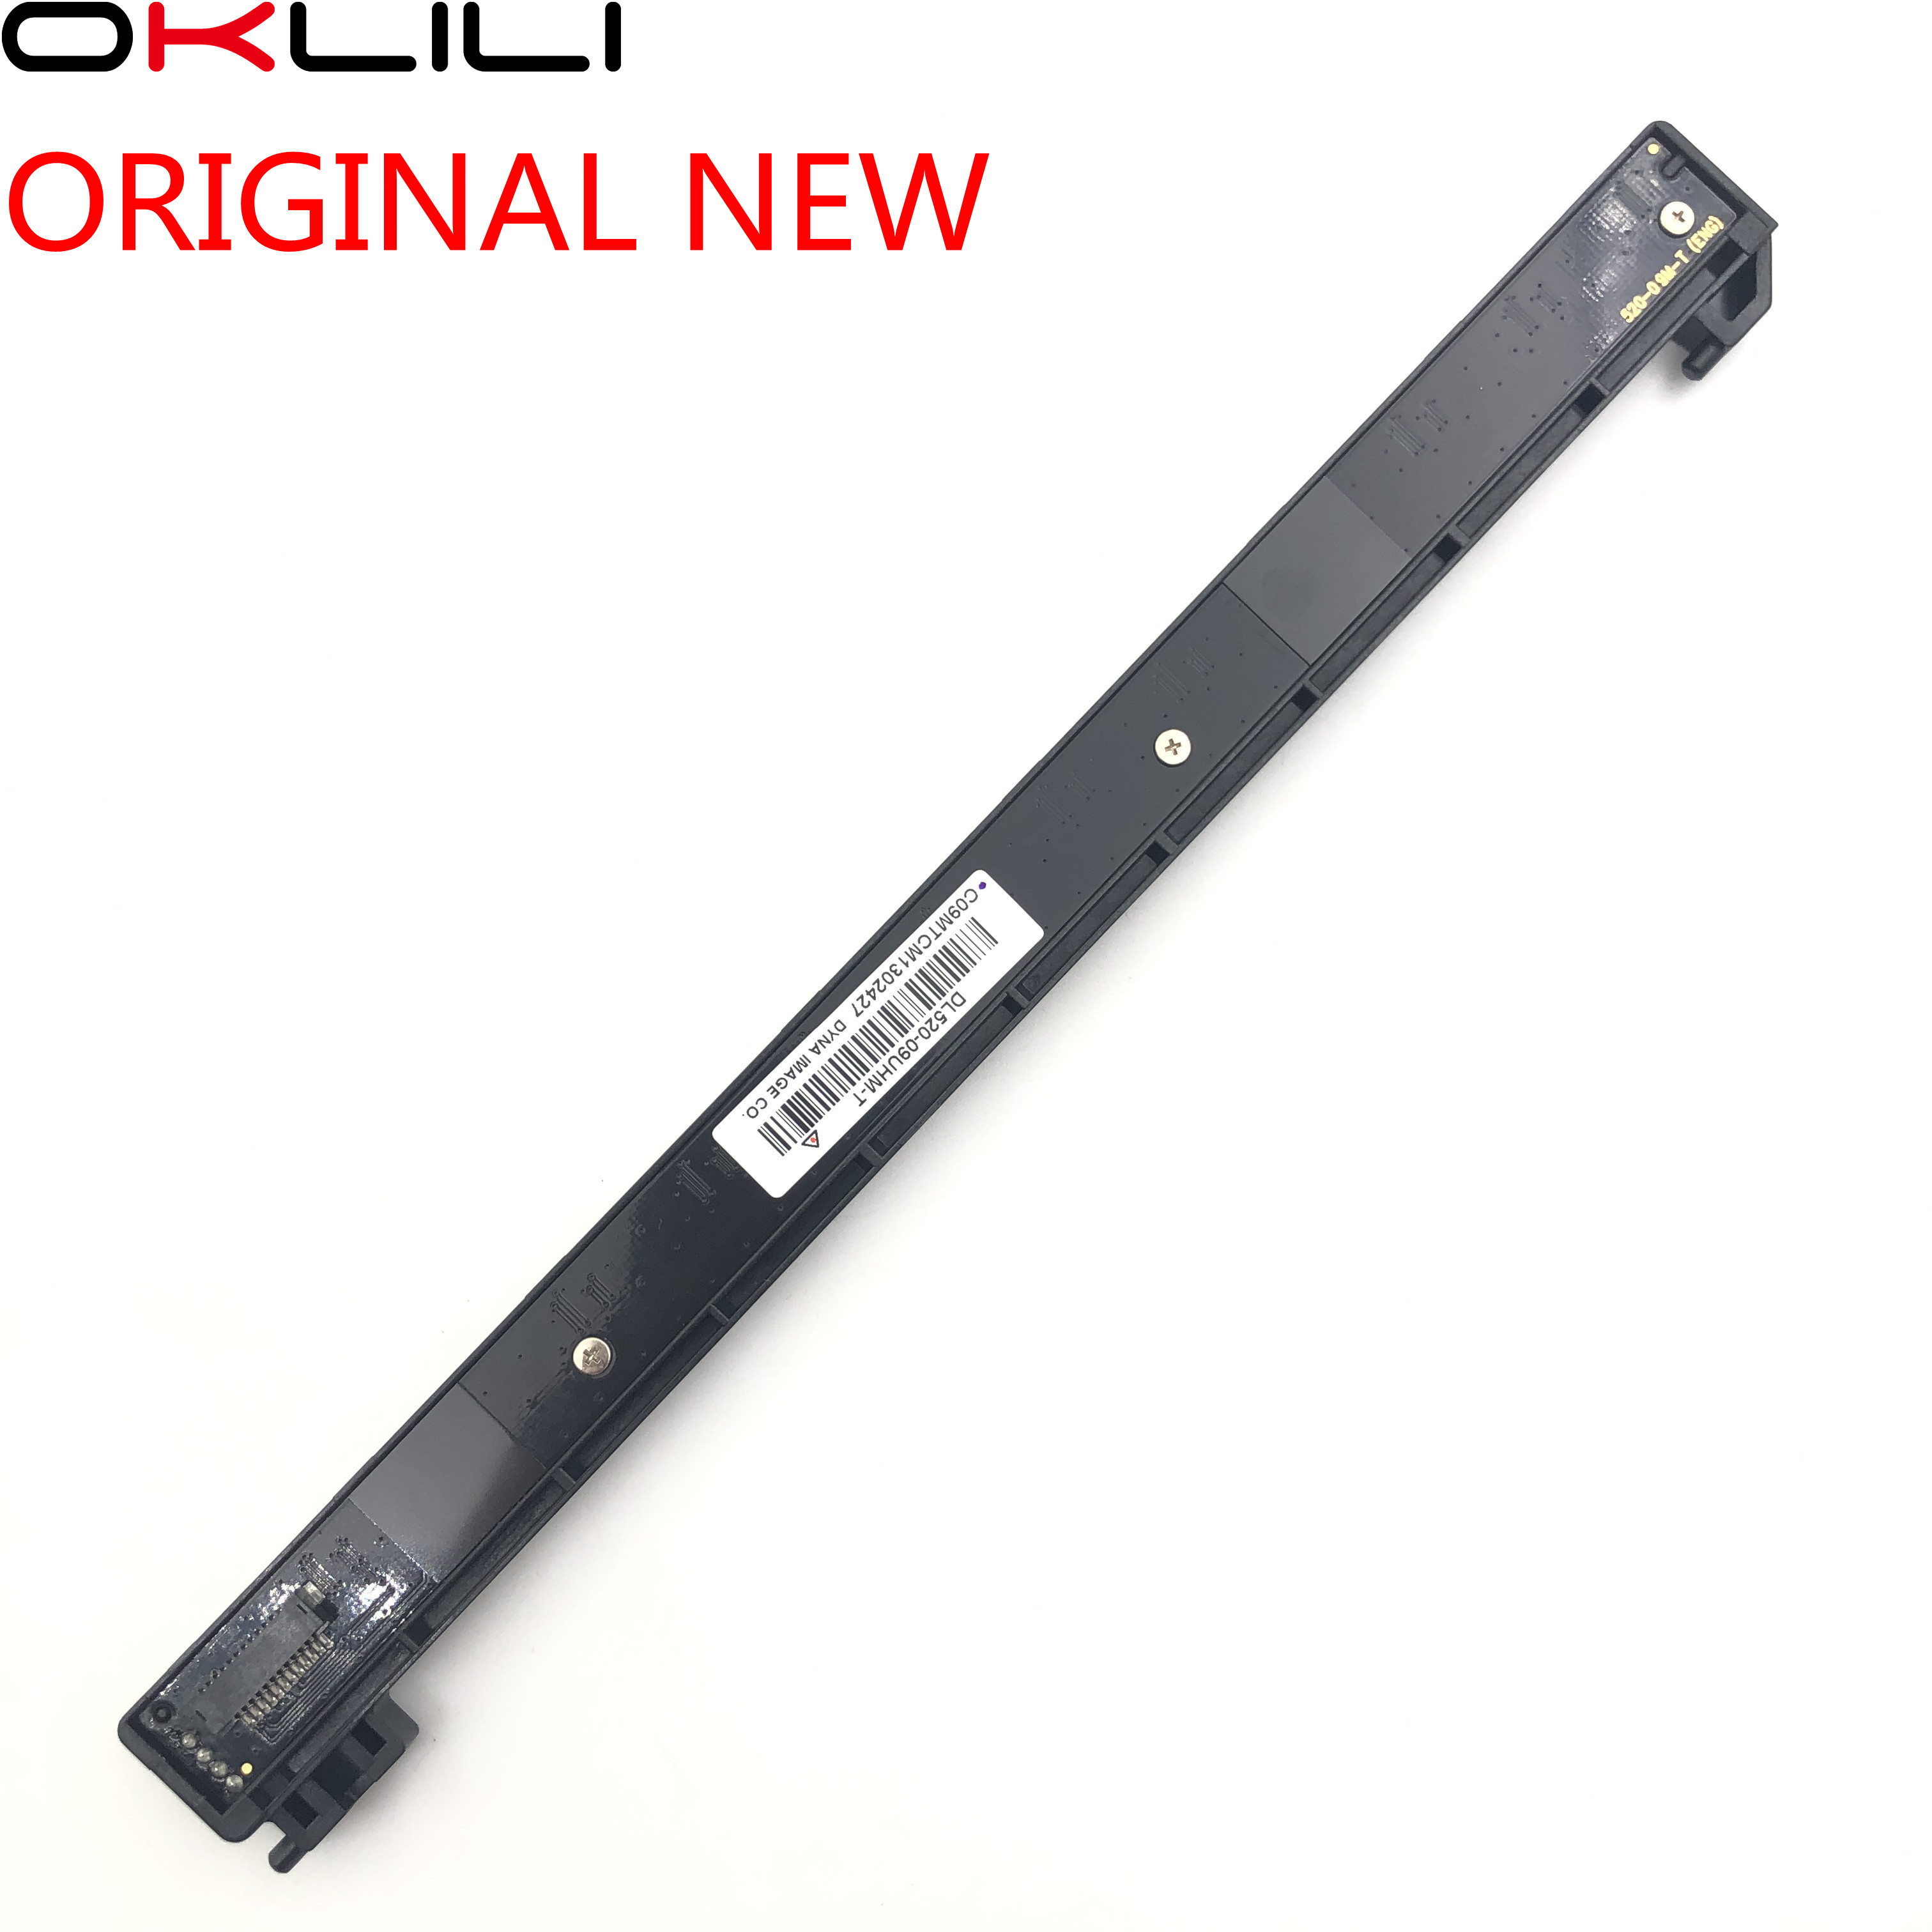 1PC X NEW 0609-001396 Contact Image Sensor CIS Scanner Head For Samsung SCX3200 SCX3201 SCX3205 SCX3206 SCX3208 DL520-09UHM-T